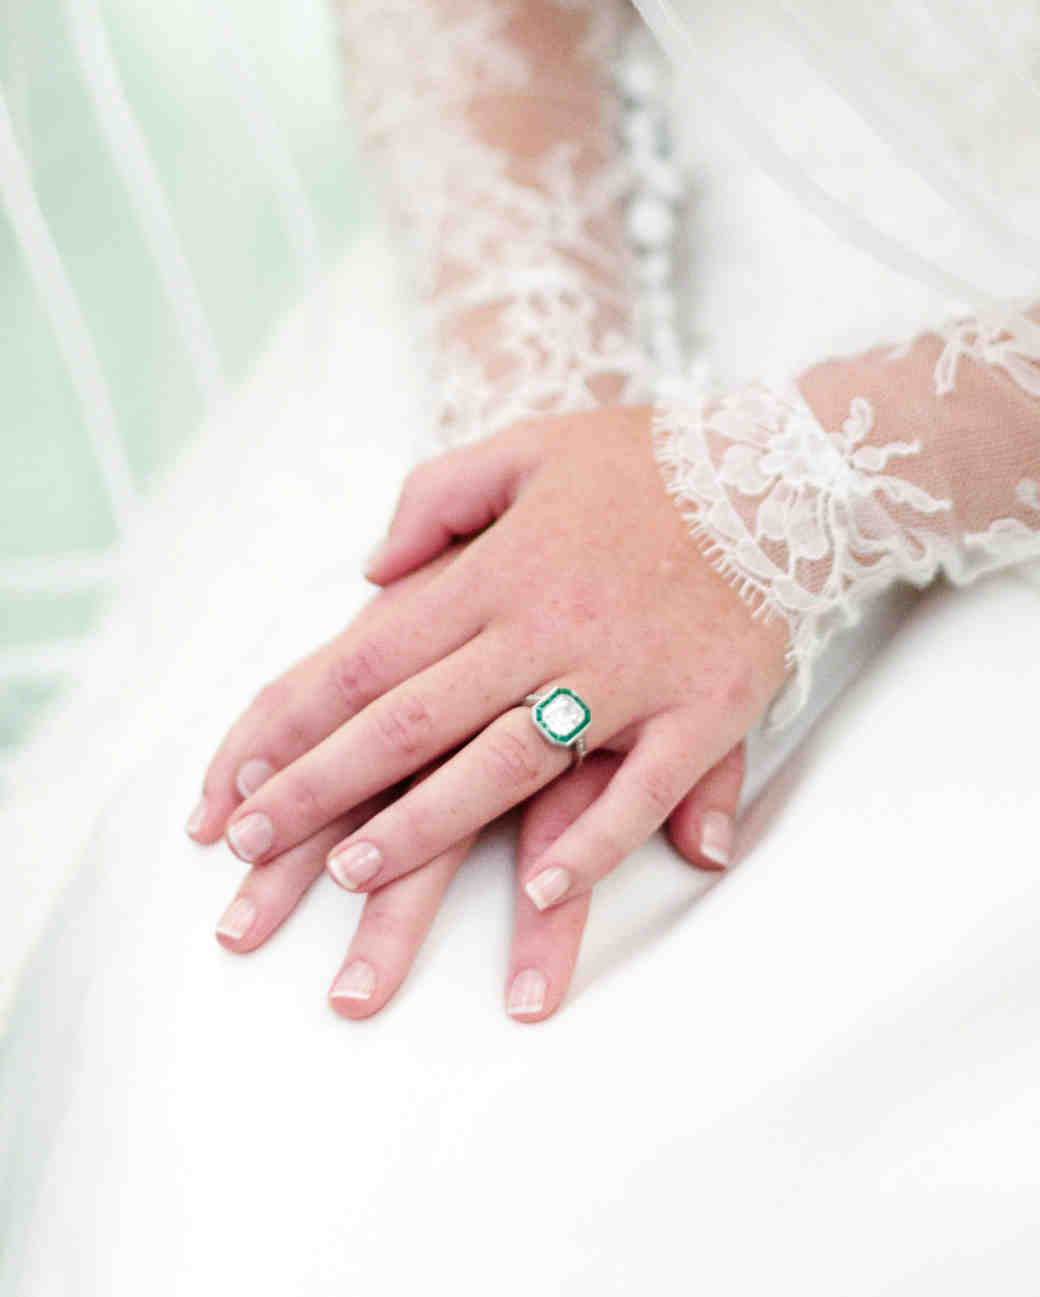 lilly-sean-wedding-ring-00321-s112089-0815.jpg